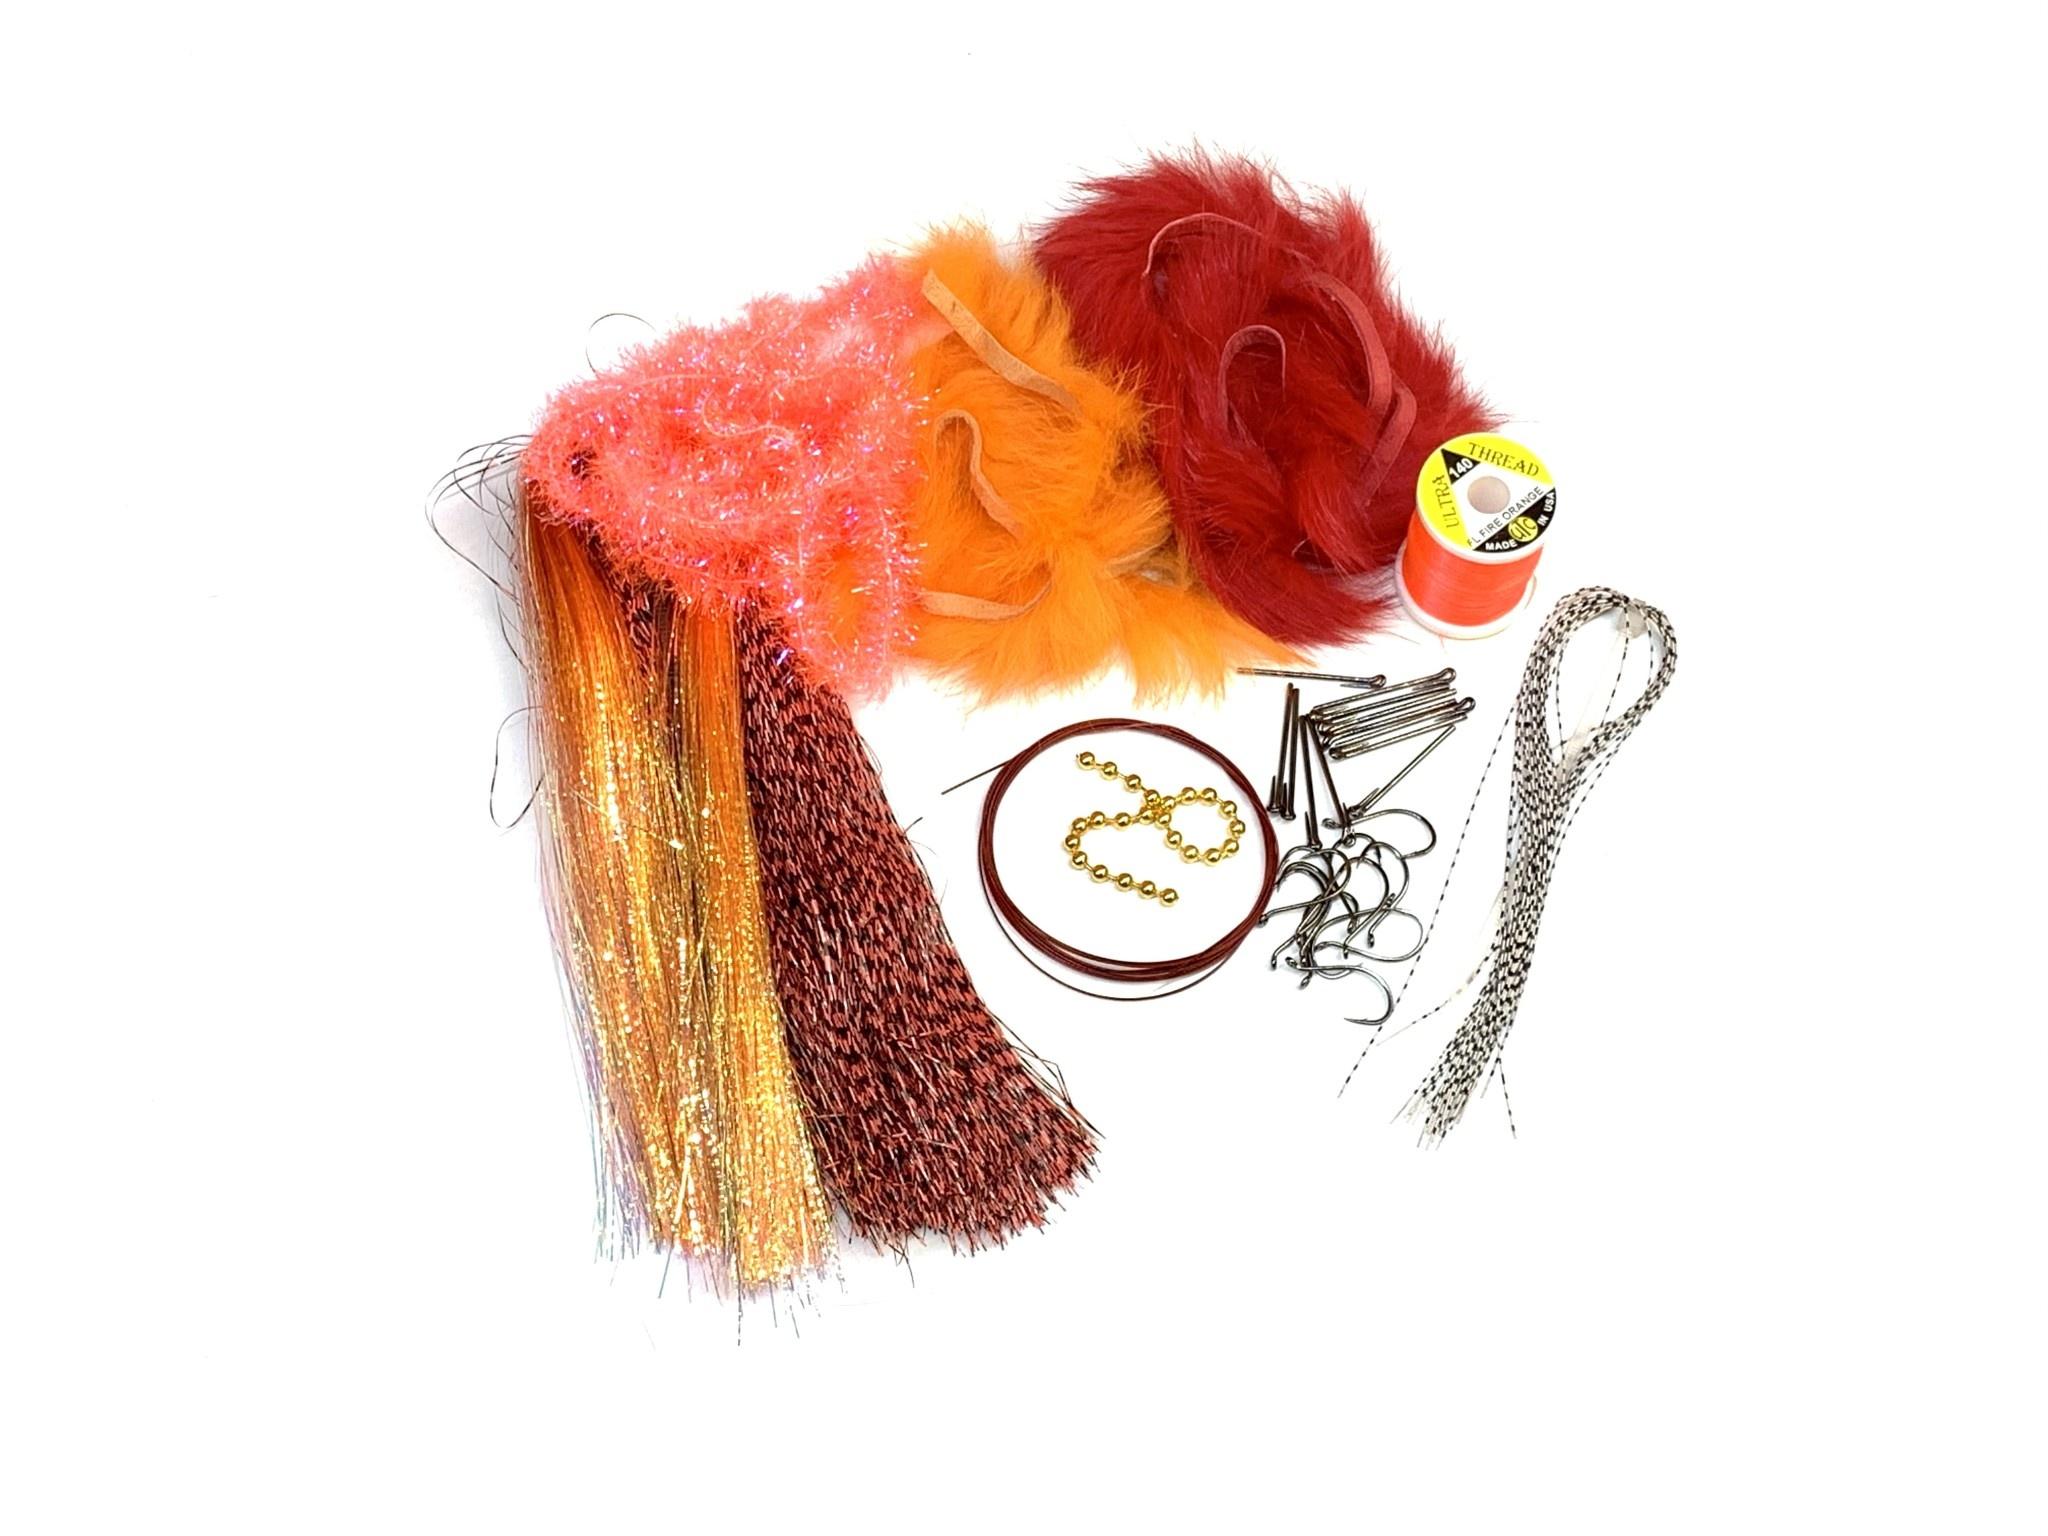 Klamath Intruder Fly Tying Kit